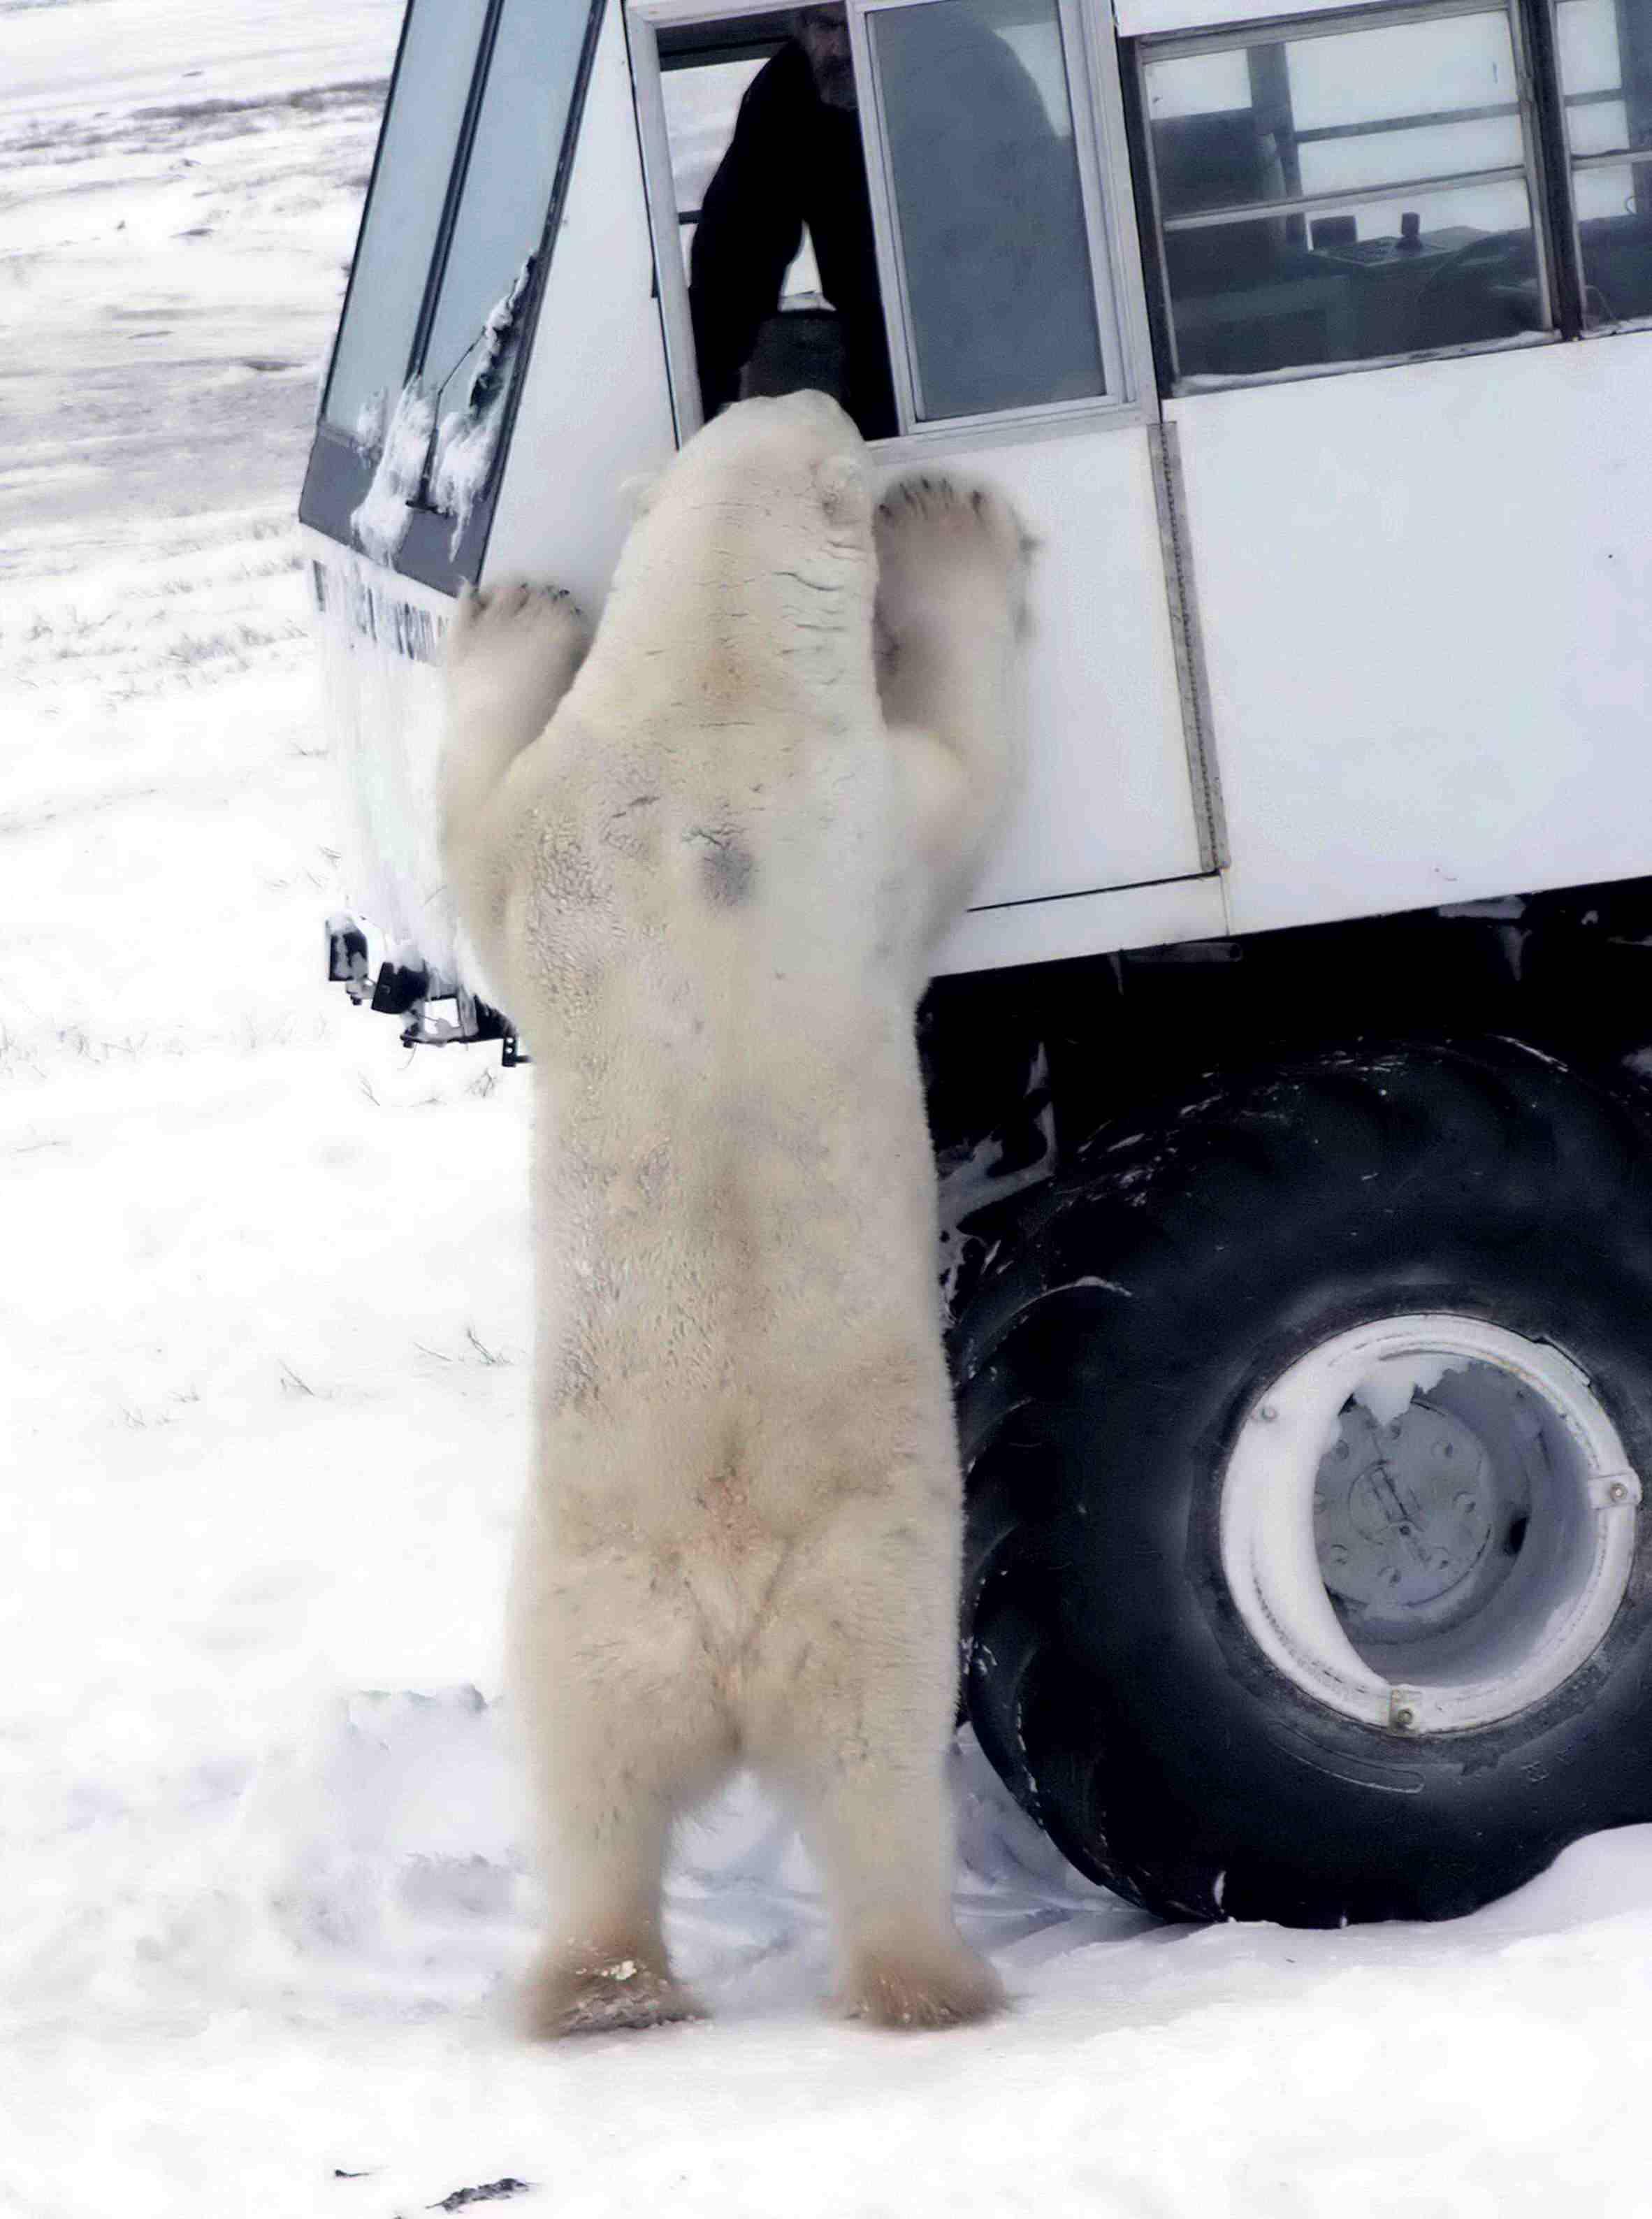 [Image: Tundra_Buggy_2004-11-13.jpg]